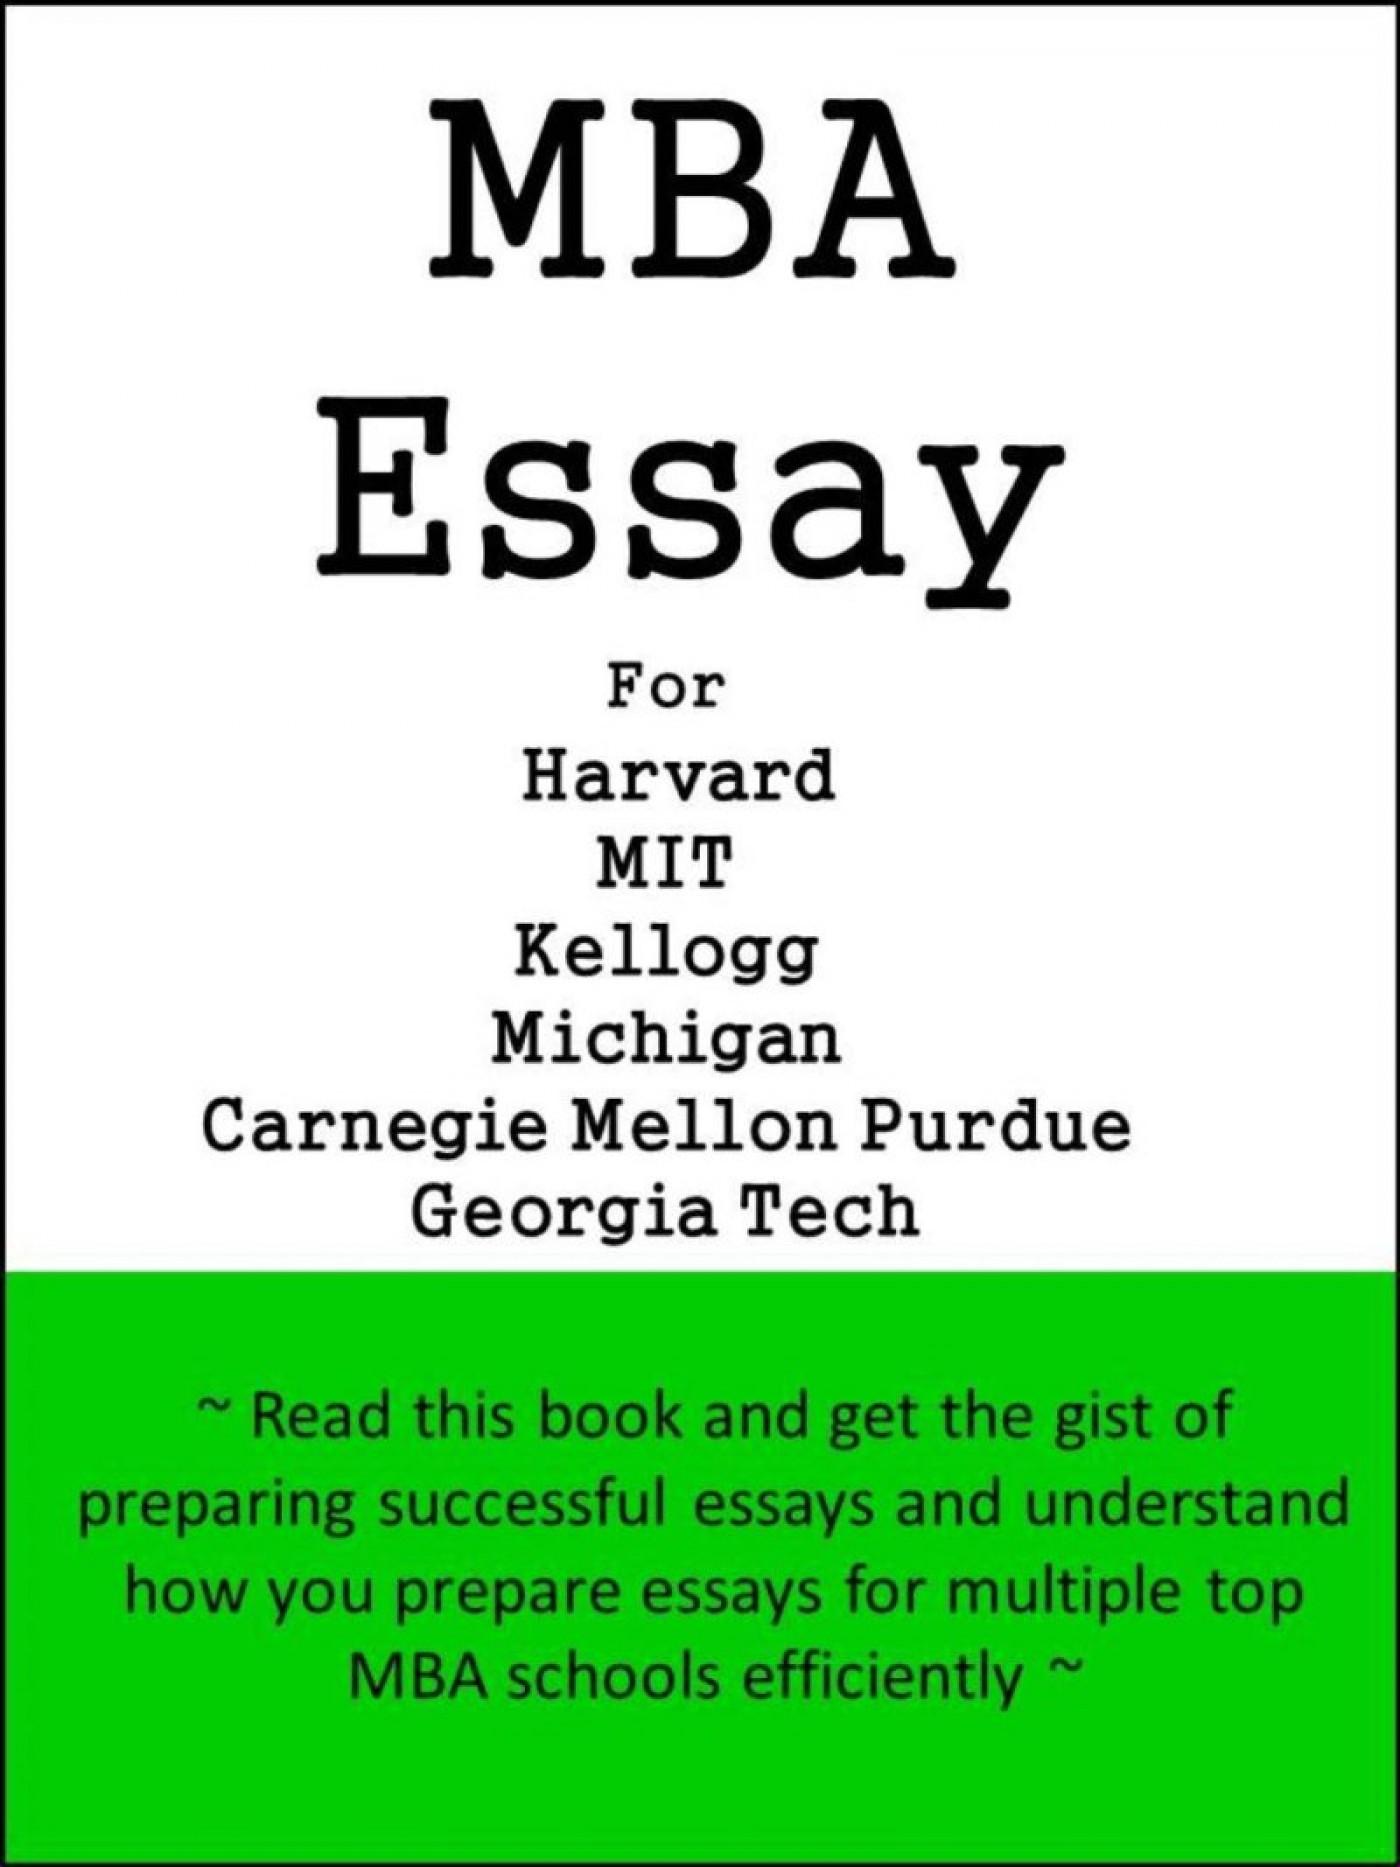 007 Kellogg Mba Essays Poemsrom Co For Harvard Mit Michigan Carnegie Mellon Purdue Georgia Tech 205 Questions Imposing Essay Prompts 2018 Tips Reddit 1400